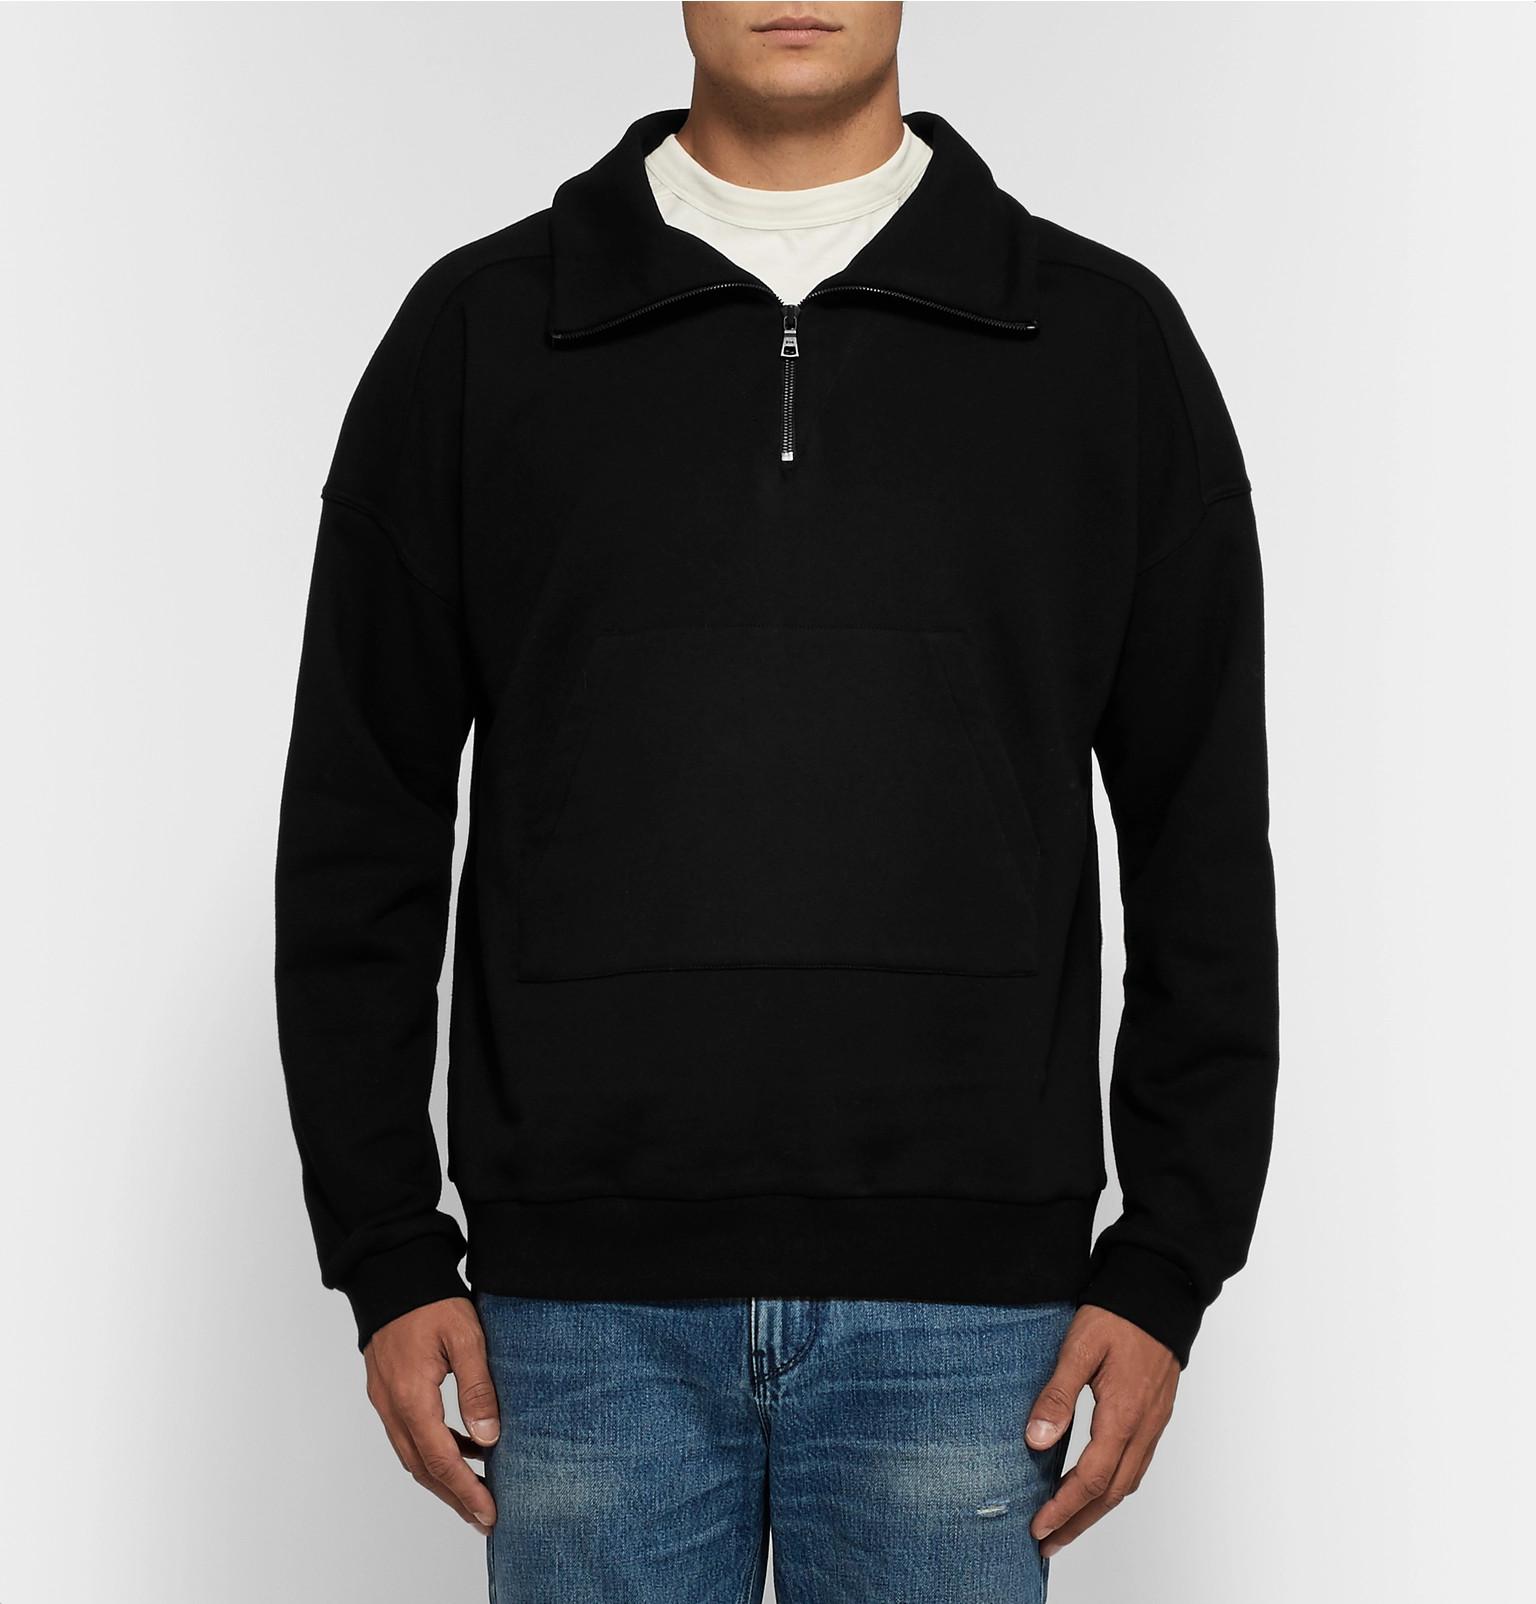 Zip Jersey Half Rtaloopback Sweatshirt Cotton qBn8Oznt